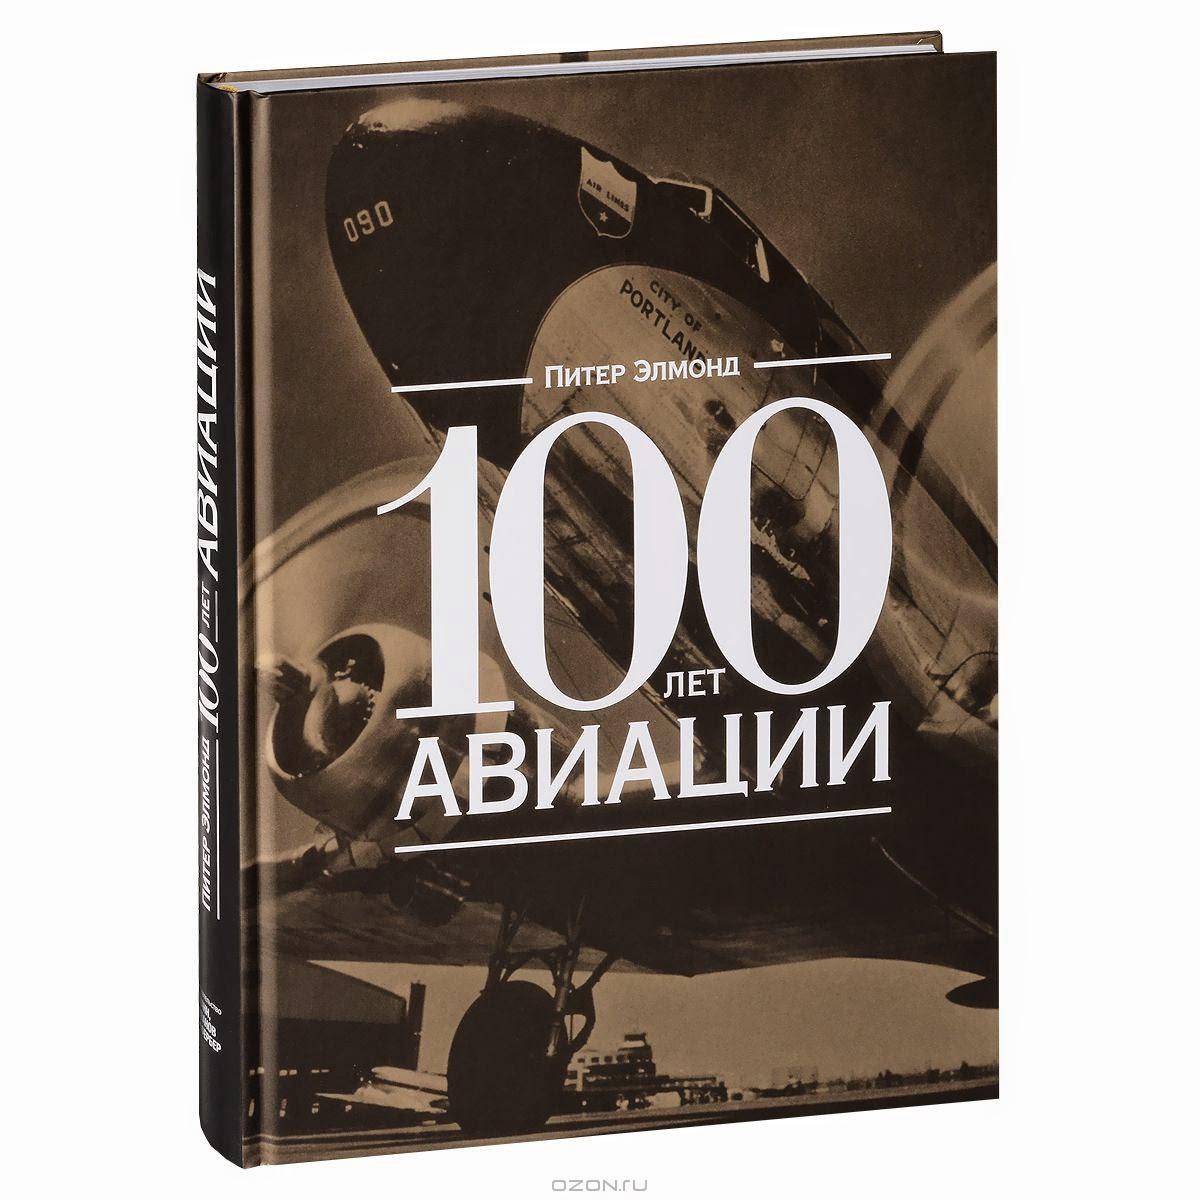 Книга: 100 лет авиации.